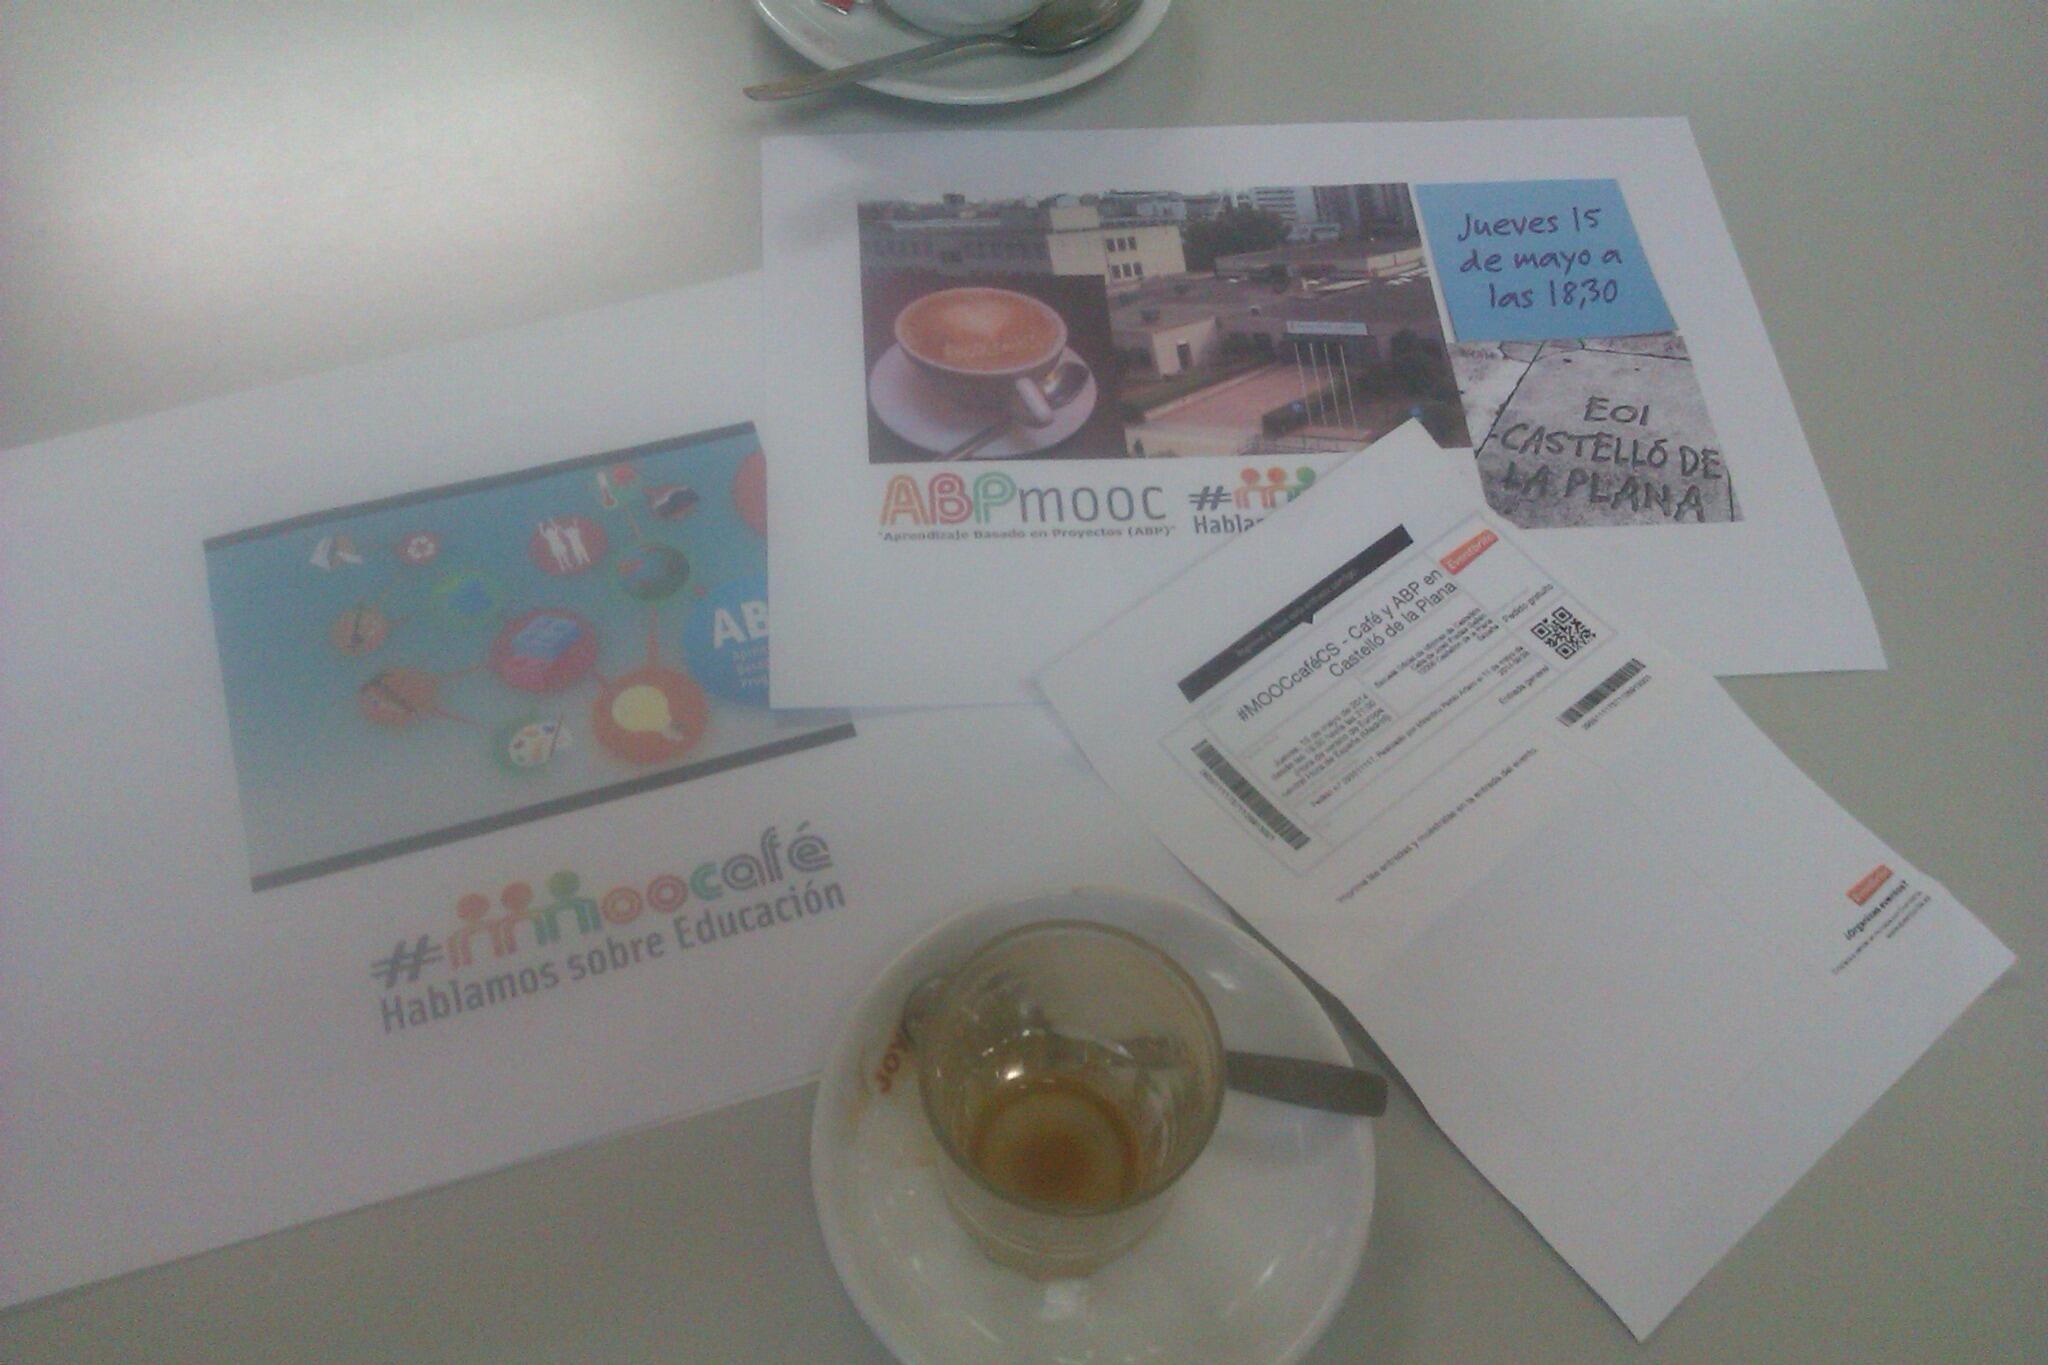 Thumbnail for #MOOCcaféCS Café y ABP en Castelló